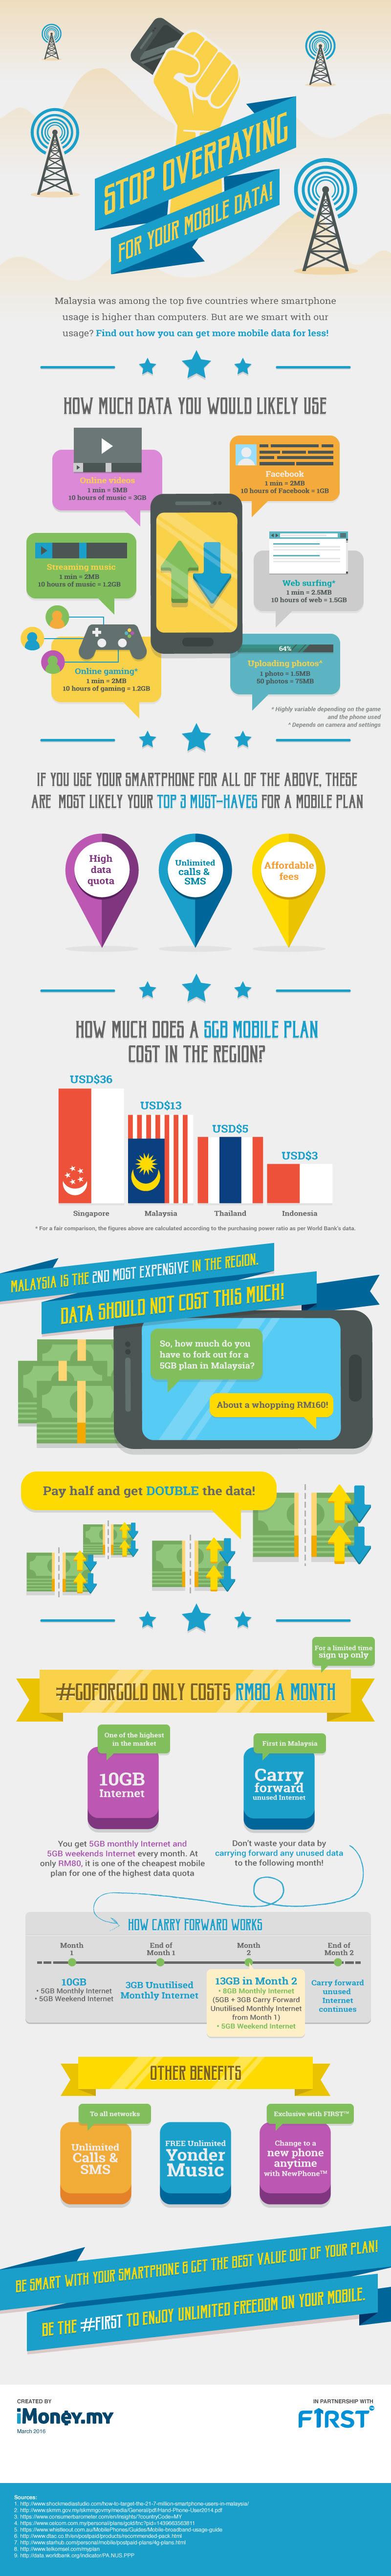 mobile data malaysia